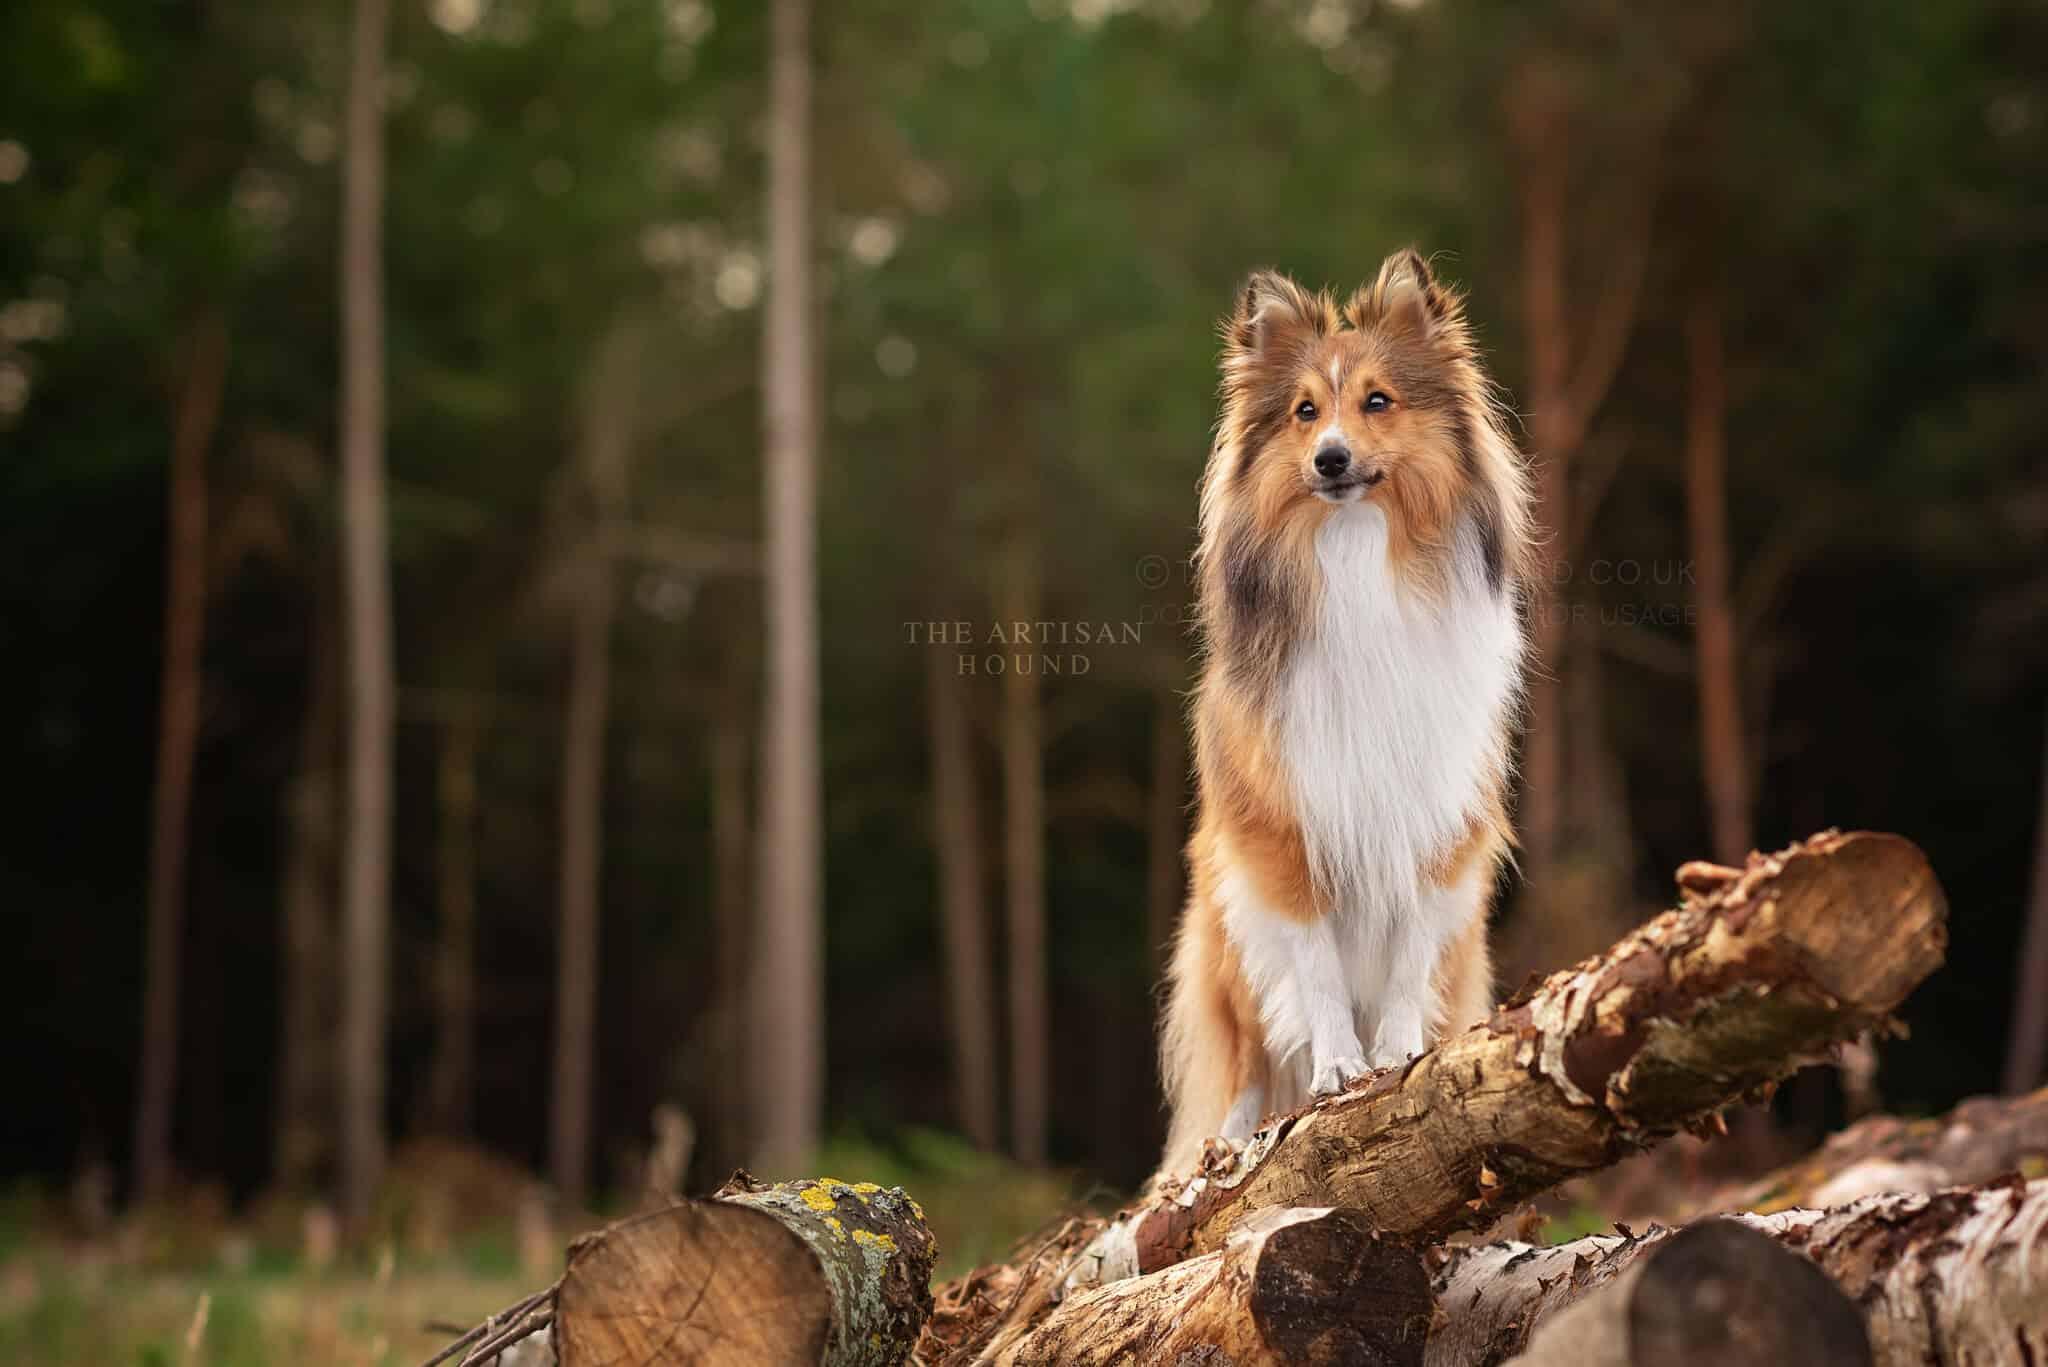 Fluffy Sheltie dog standing on pile of logs